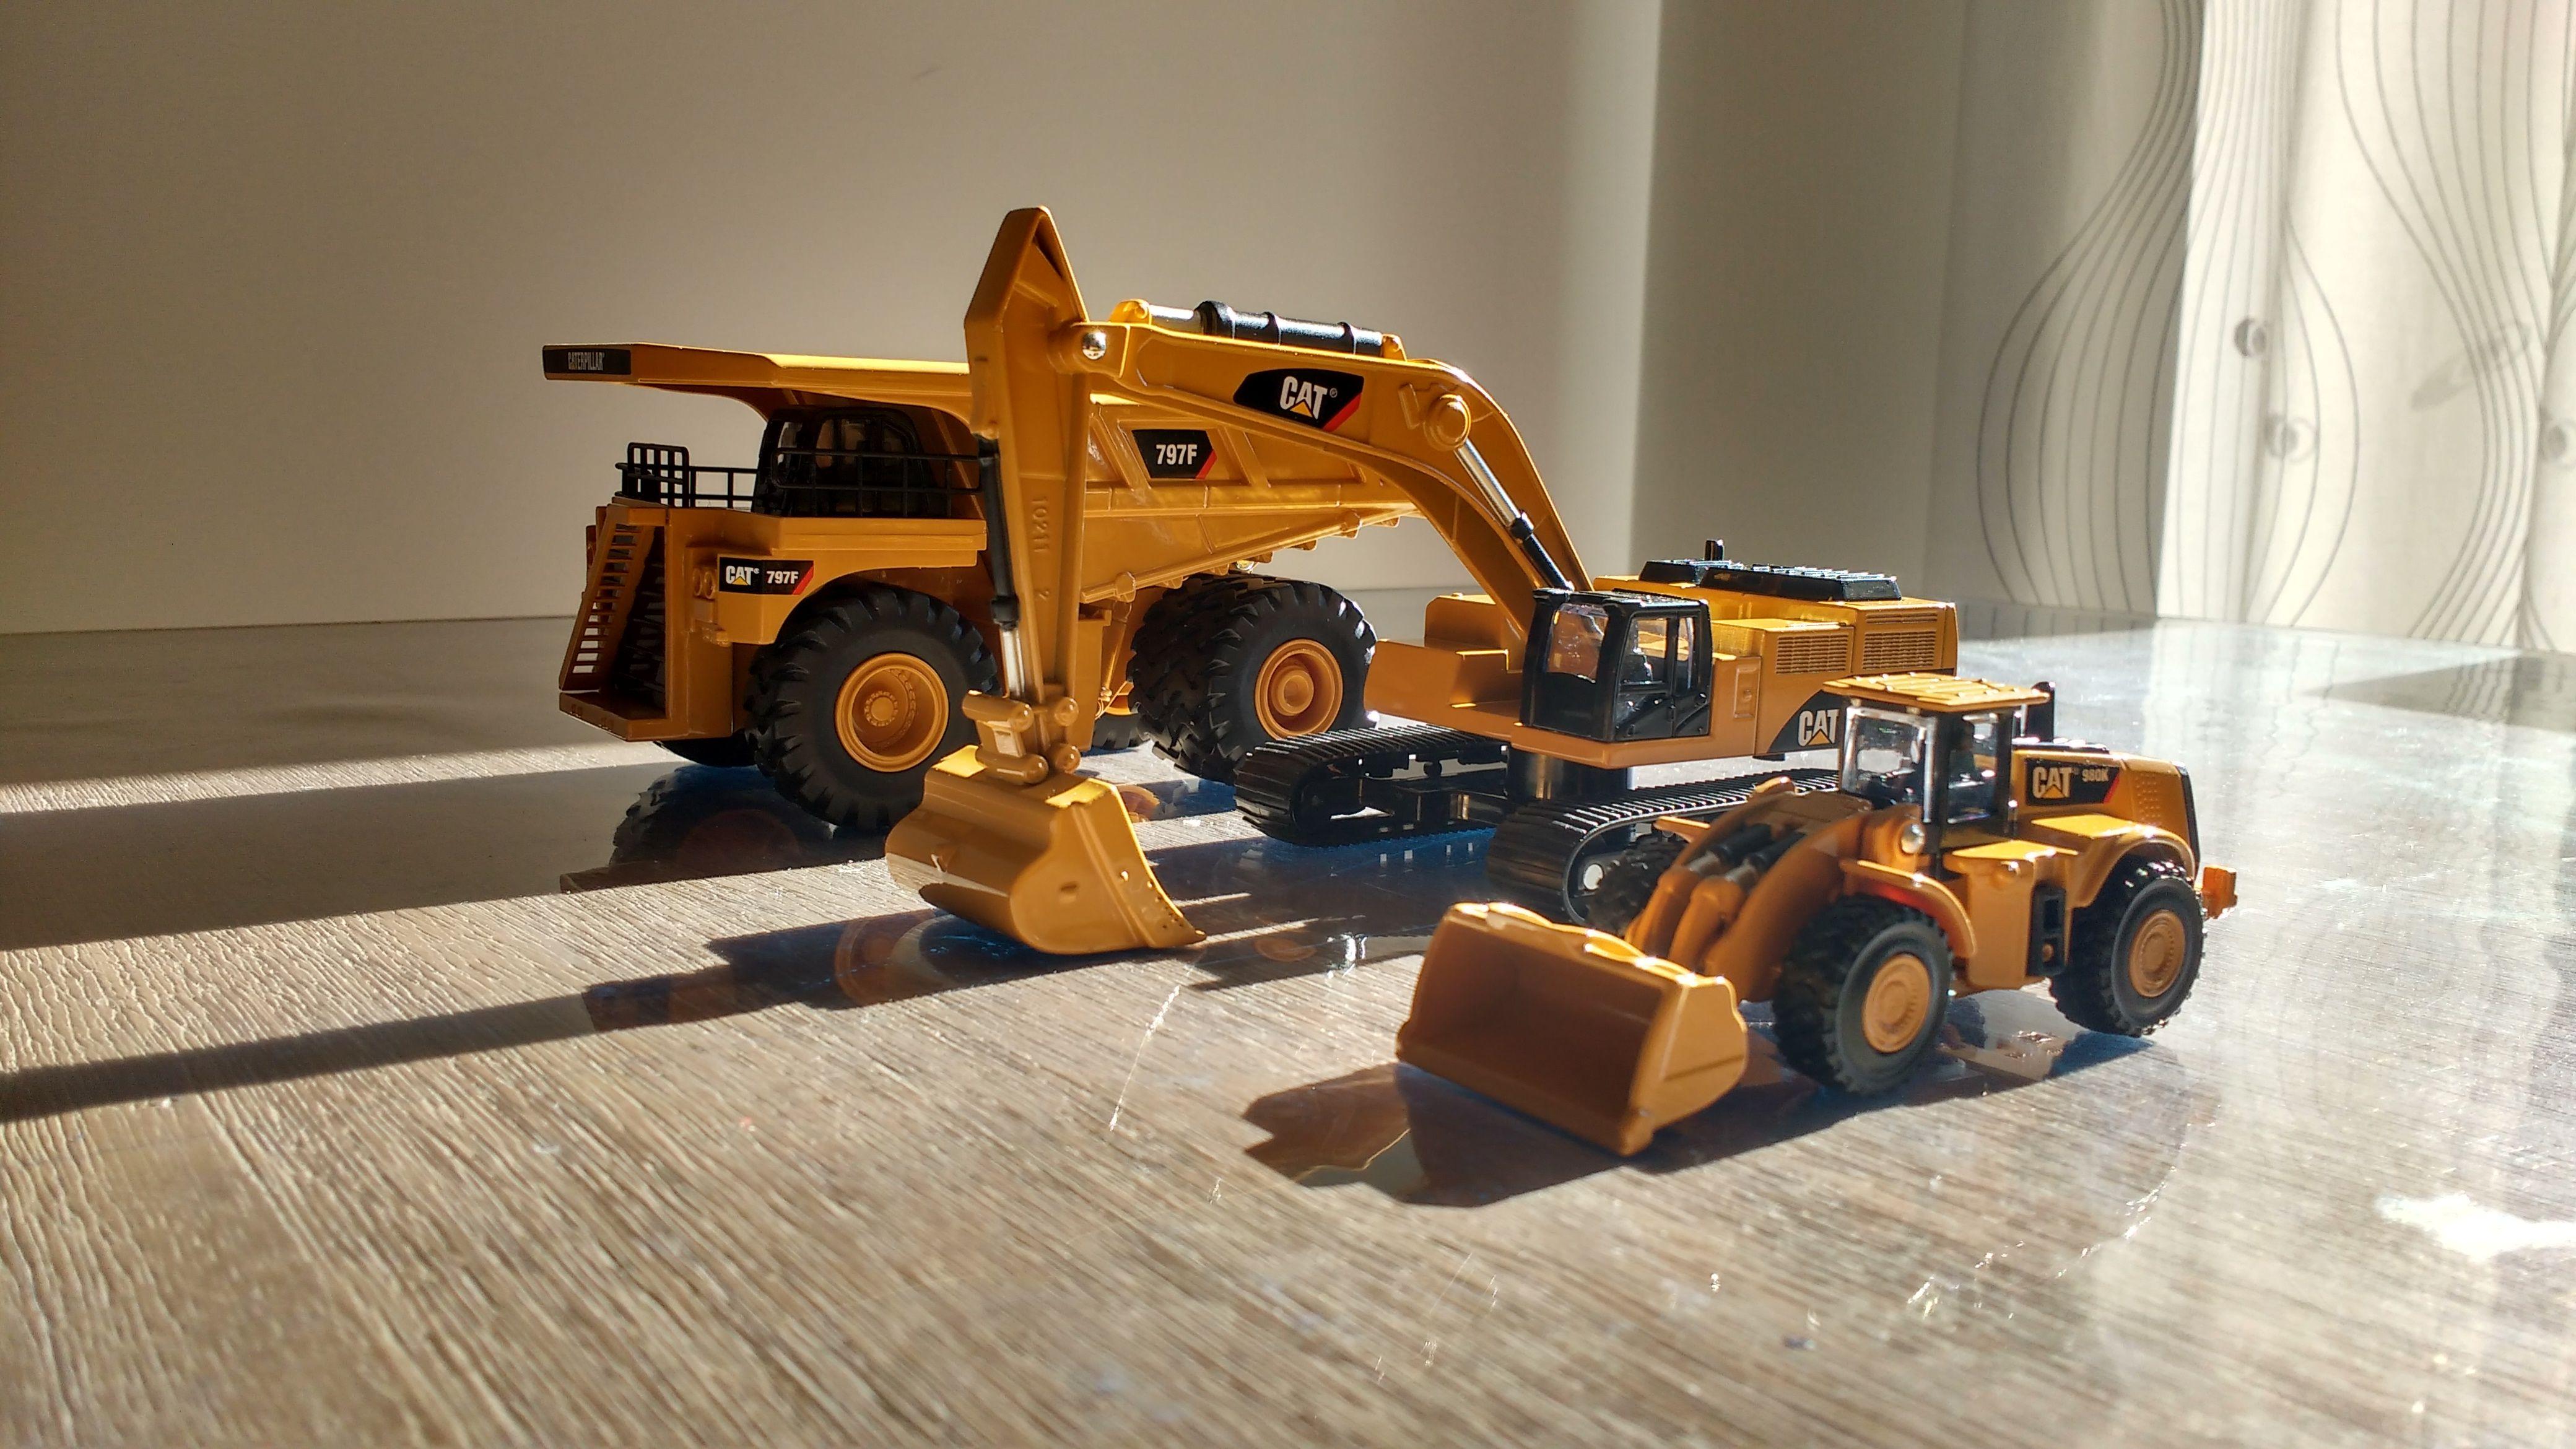 #797F #980K #390D #CAT #Caterpiller #Diecastmodels #CATModels #Construction #Mining #dumptruck #Frontloader #Excavator